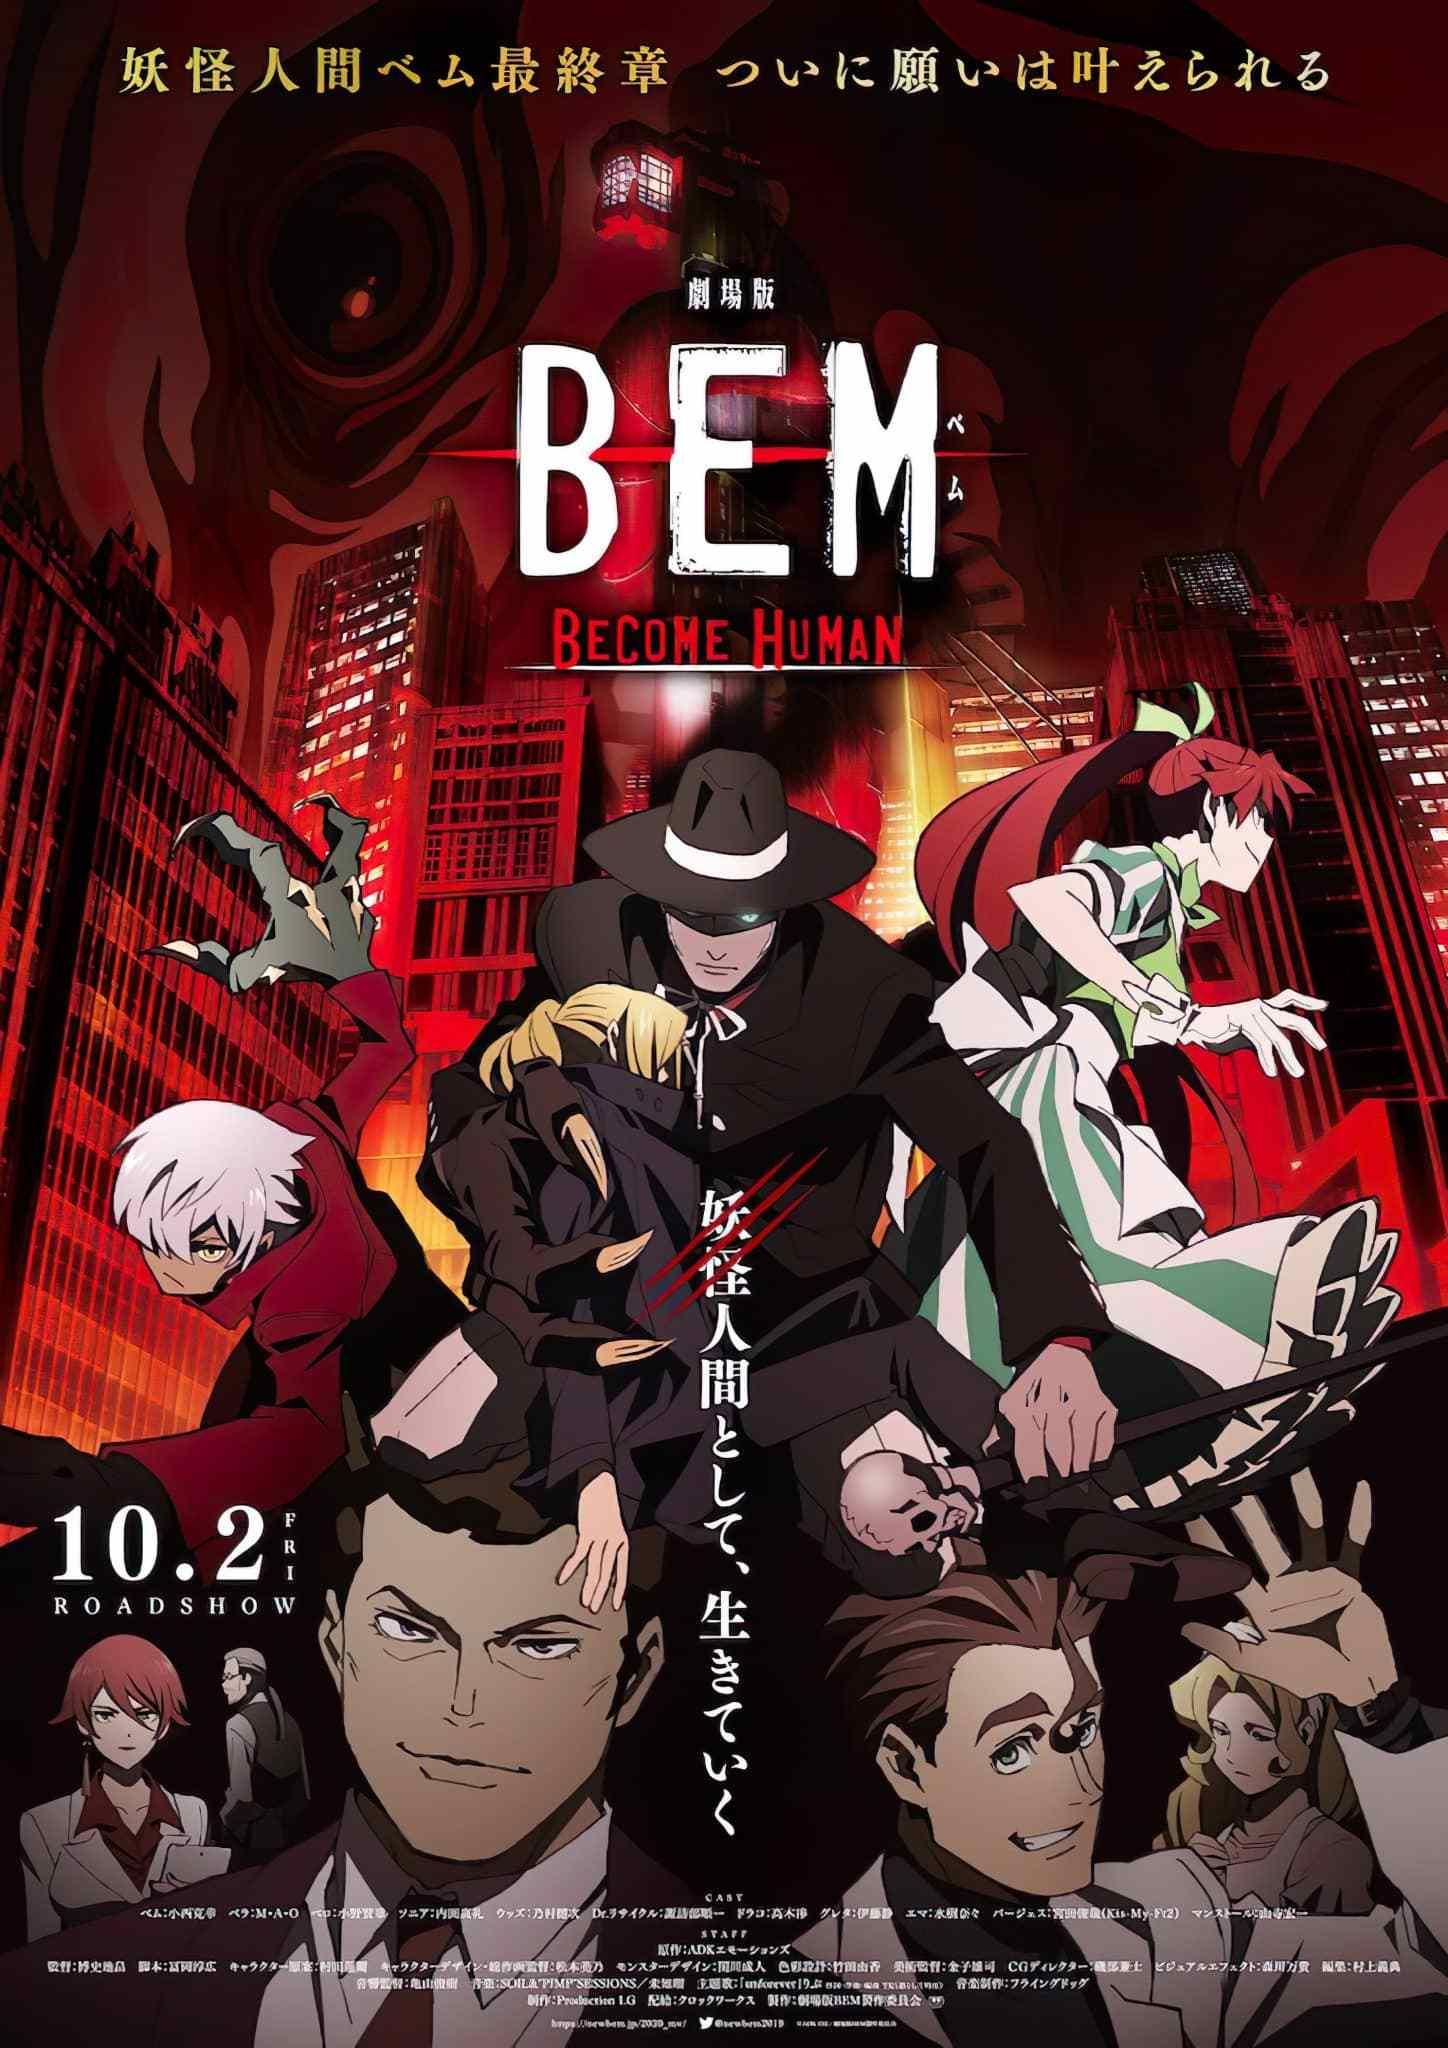 watch Gekijouban Bem: Become Human on soap2day